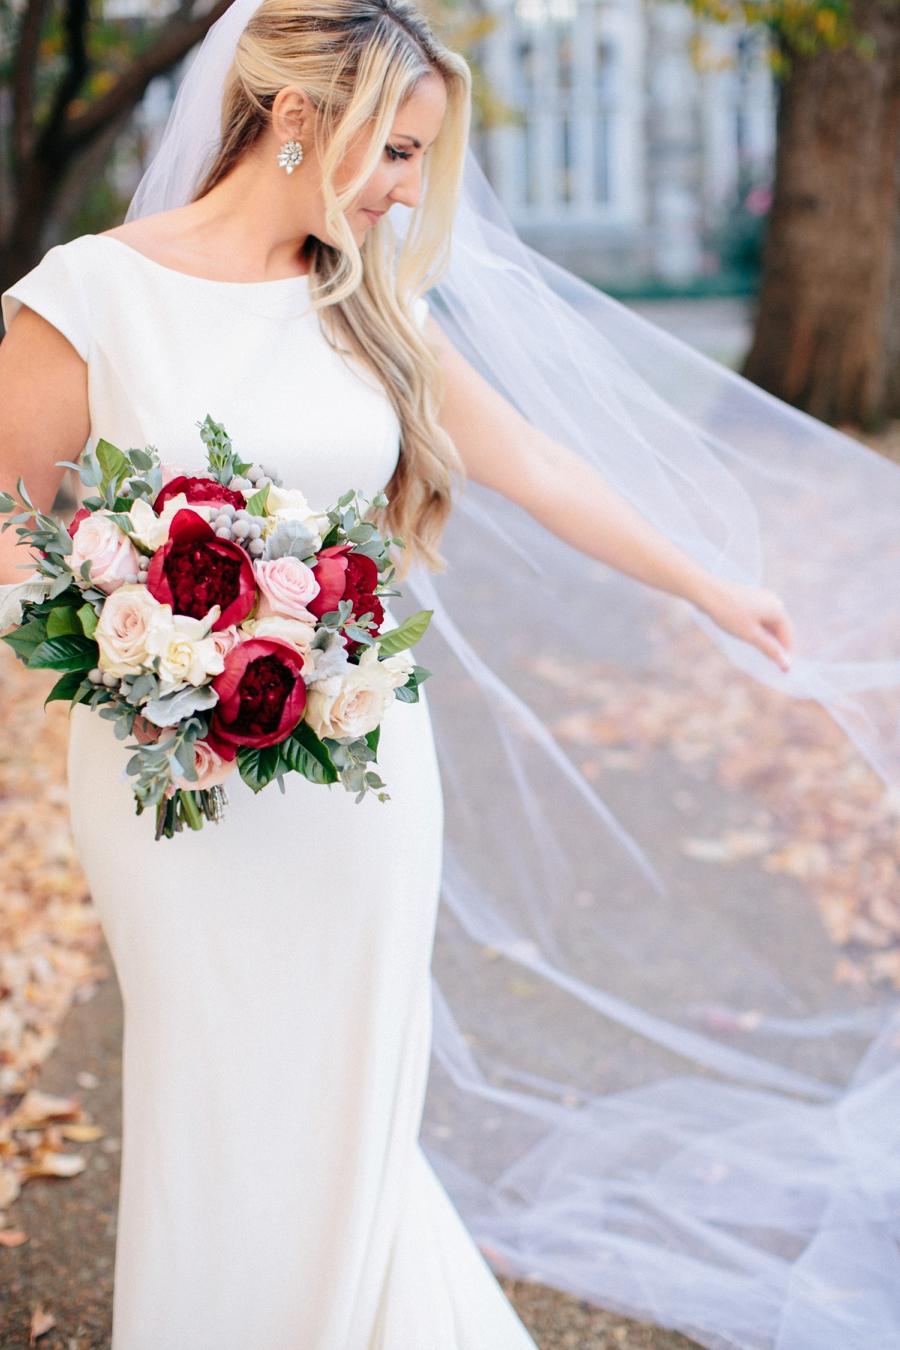 A Timeless Red & White Nashville Wedding via TheELD.com